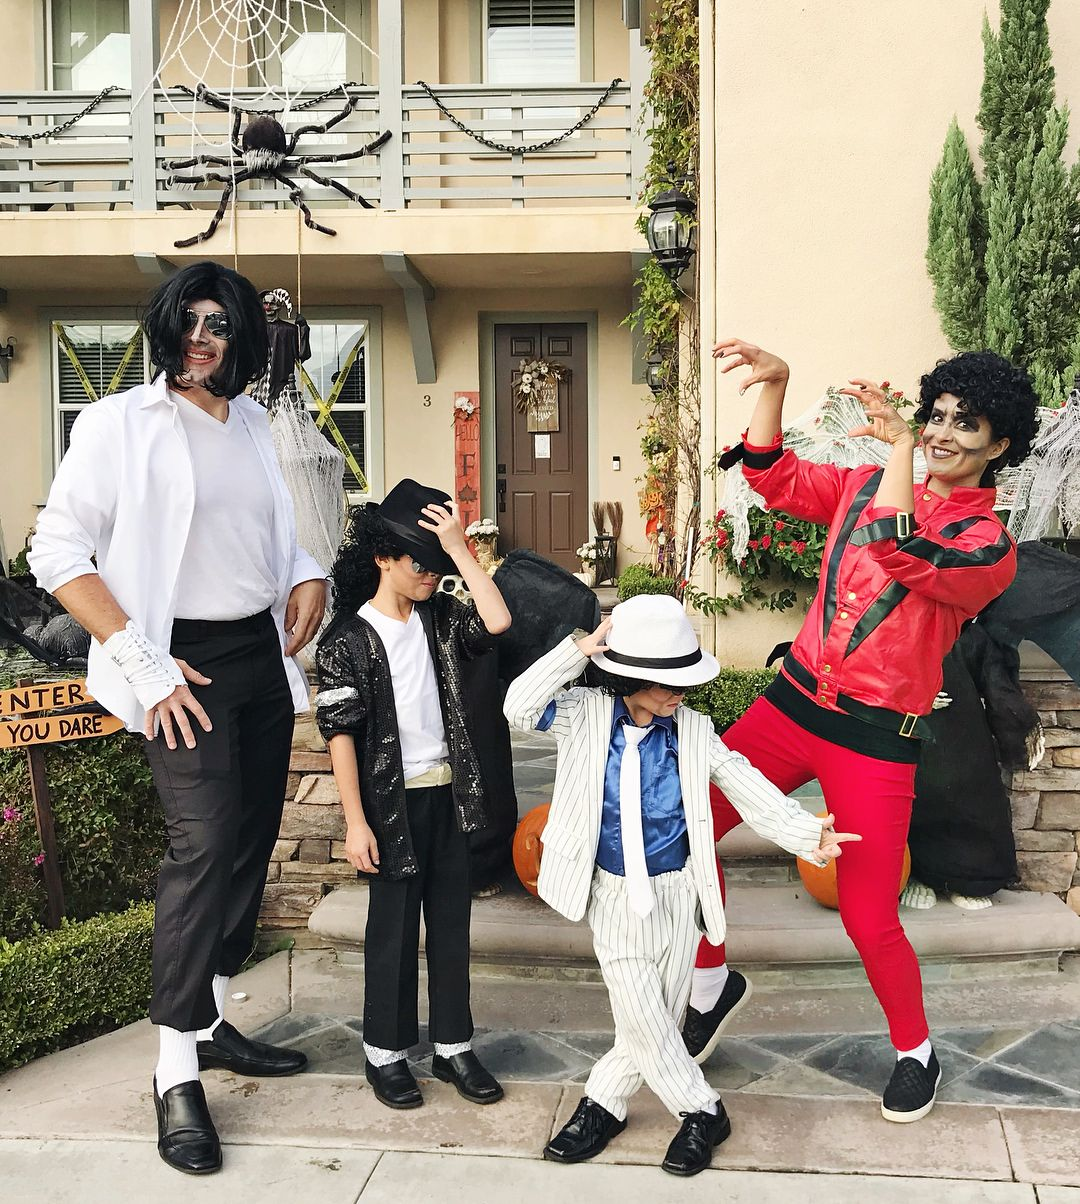 Michael Jacksons Halloween 2020 Michael Jackson Halloween Family Costume. #halloween